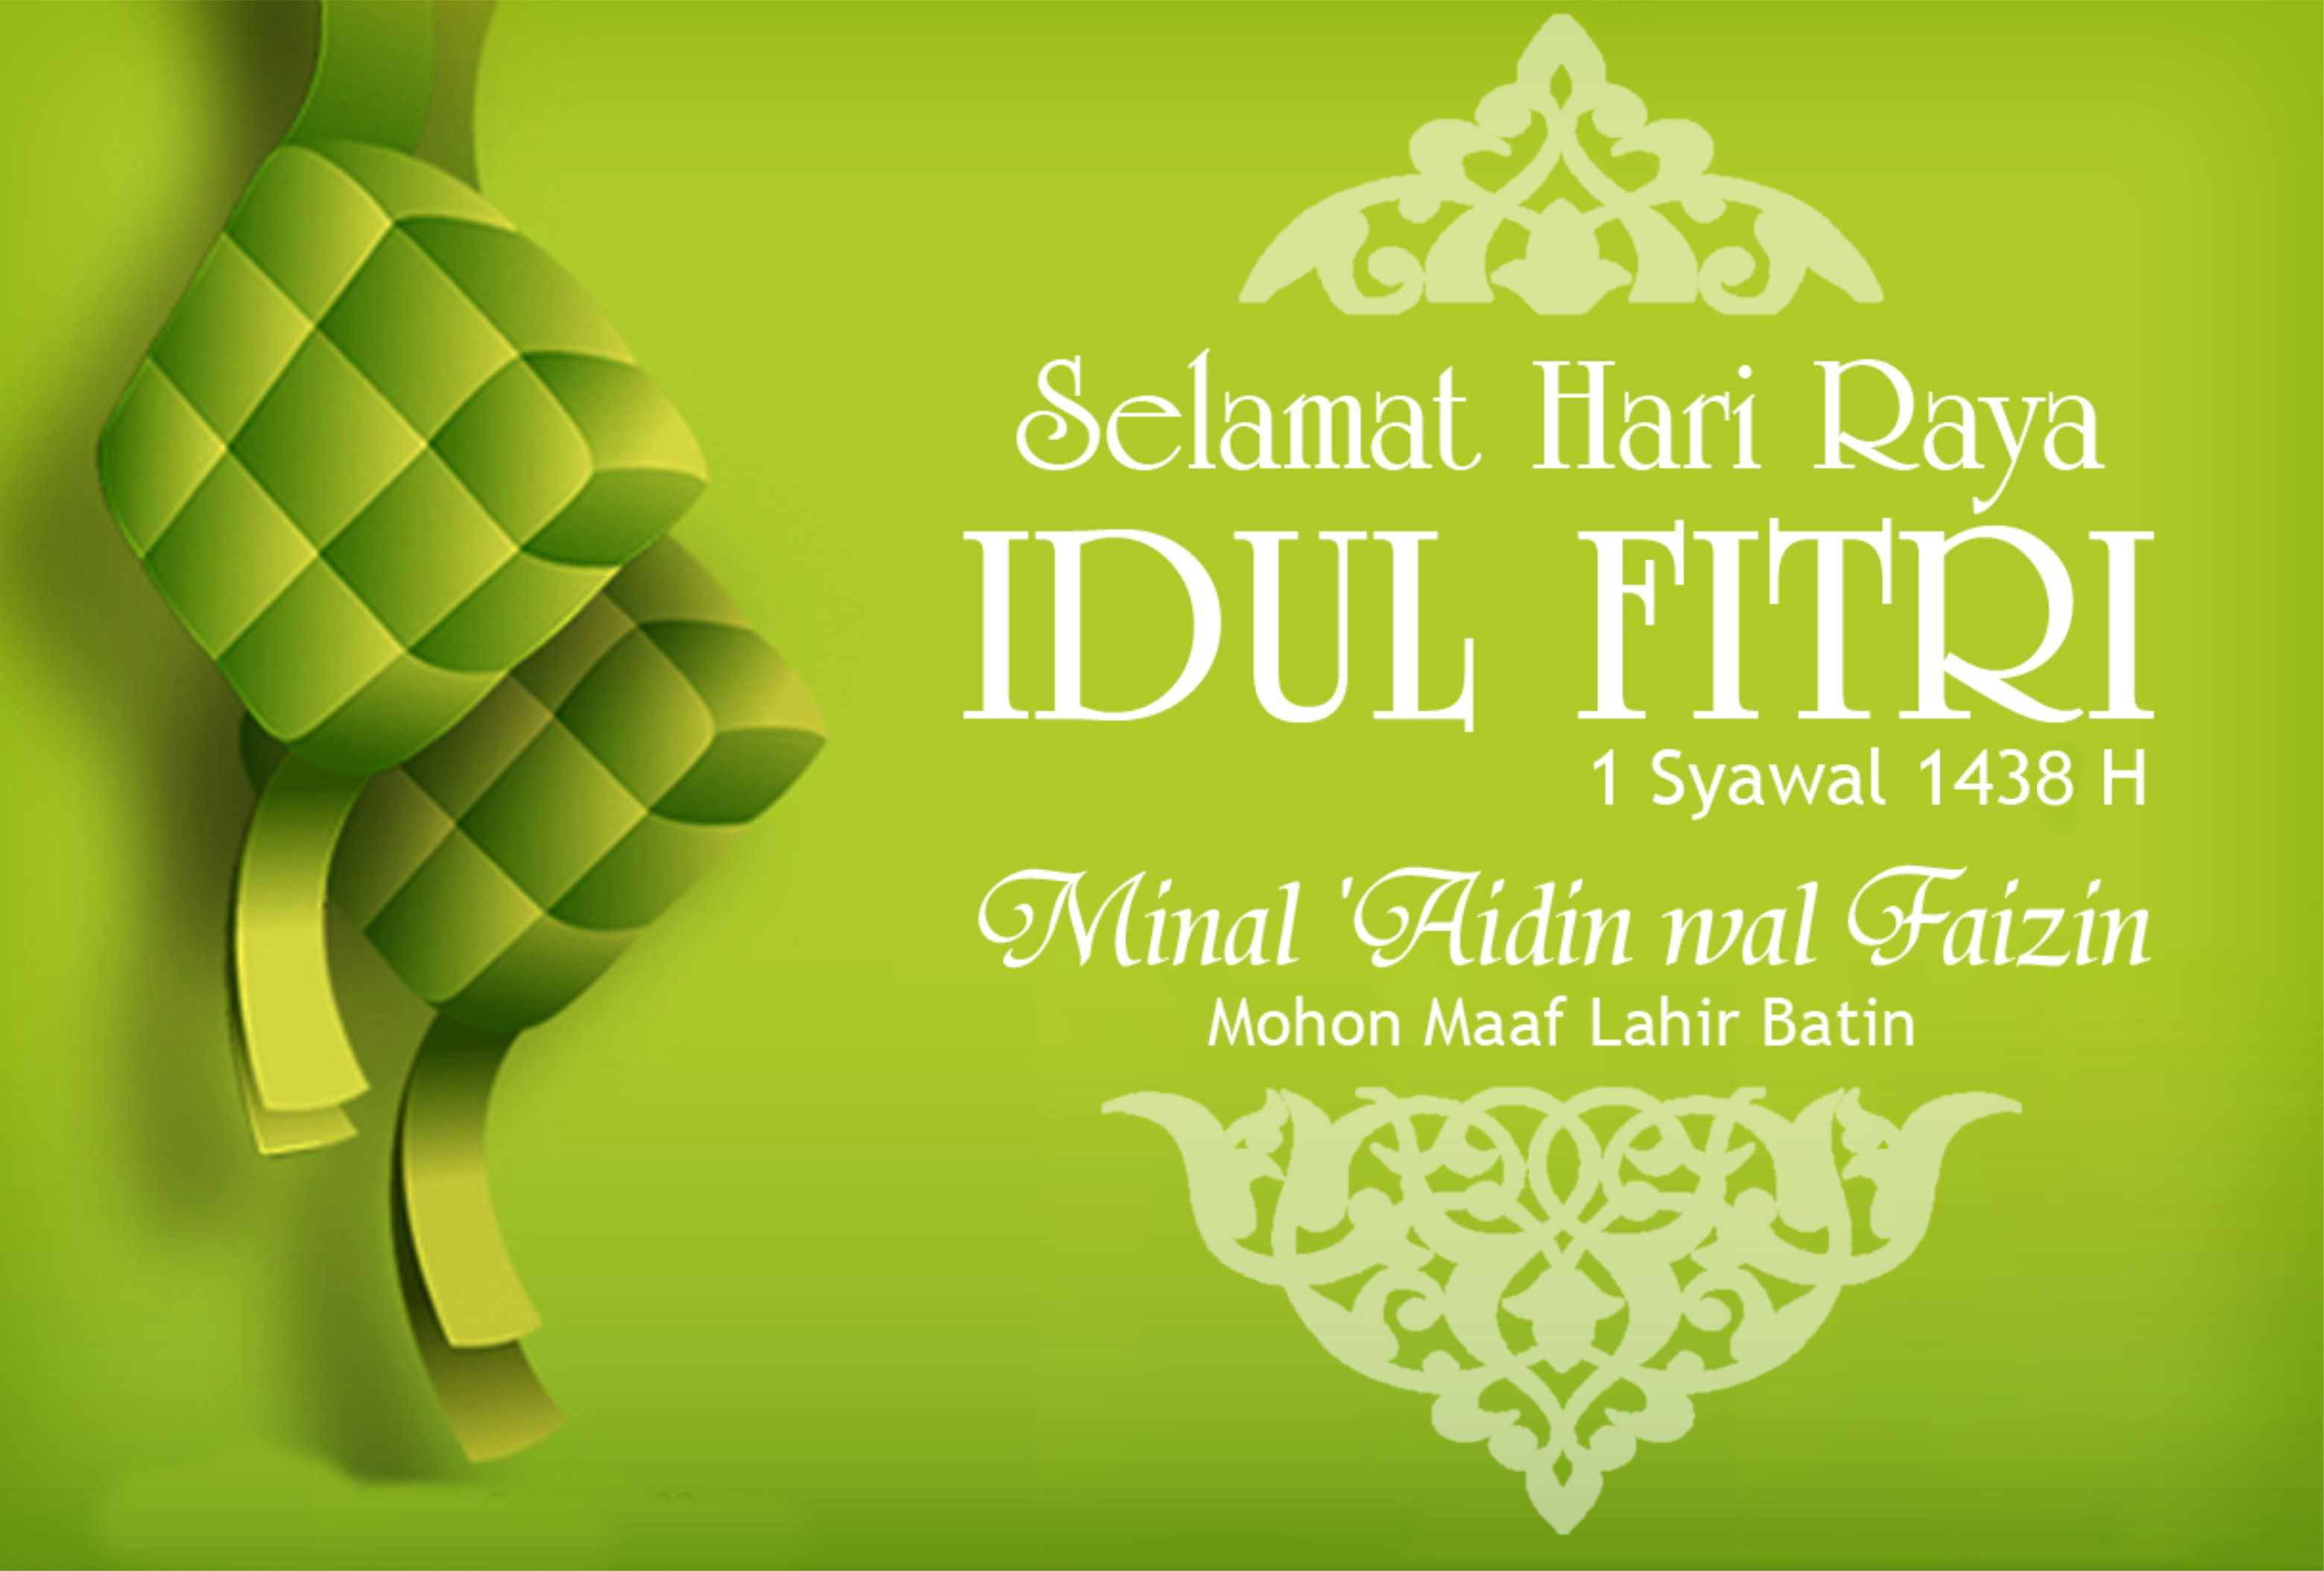 Shalat Idul Fitri 1 Syawal 1438 H 25 Juni 2017 Kepastian Tanggal